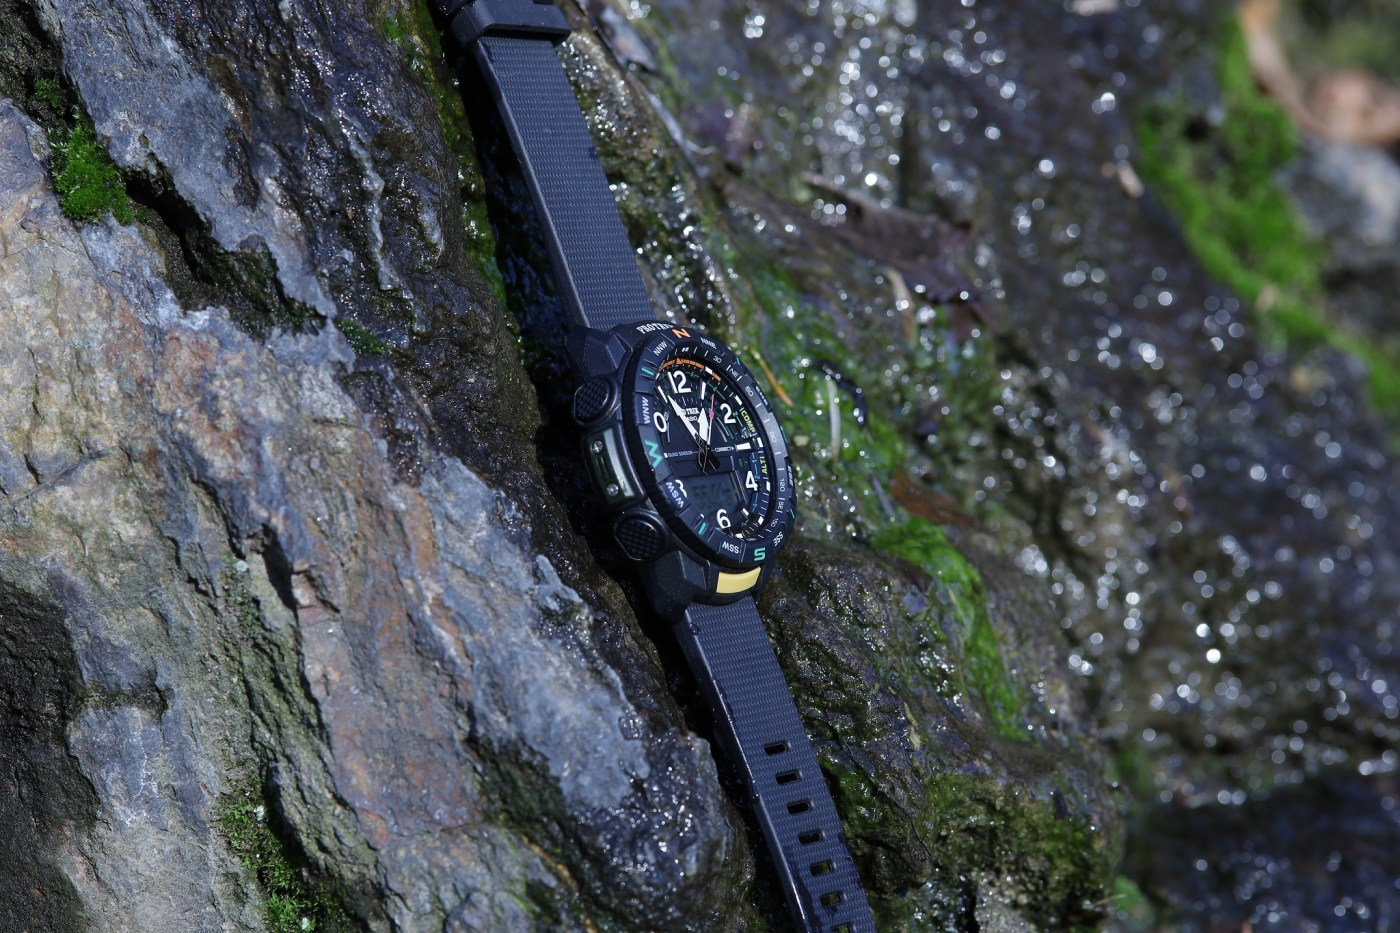 Casio Pro Trek PRT-B50 hanging on cliff face